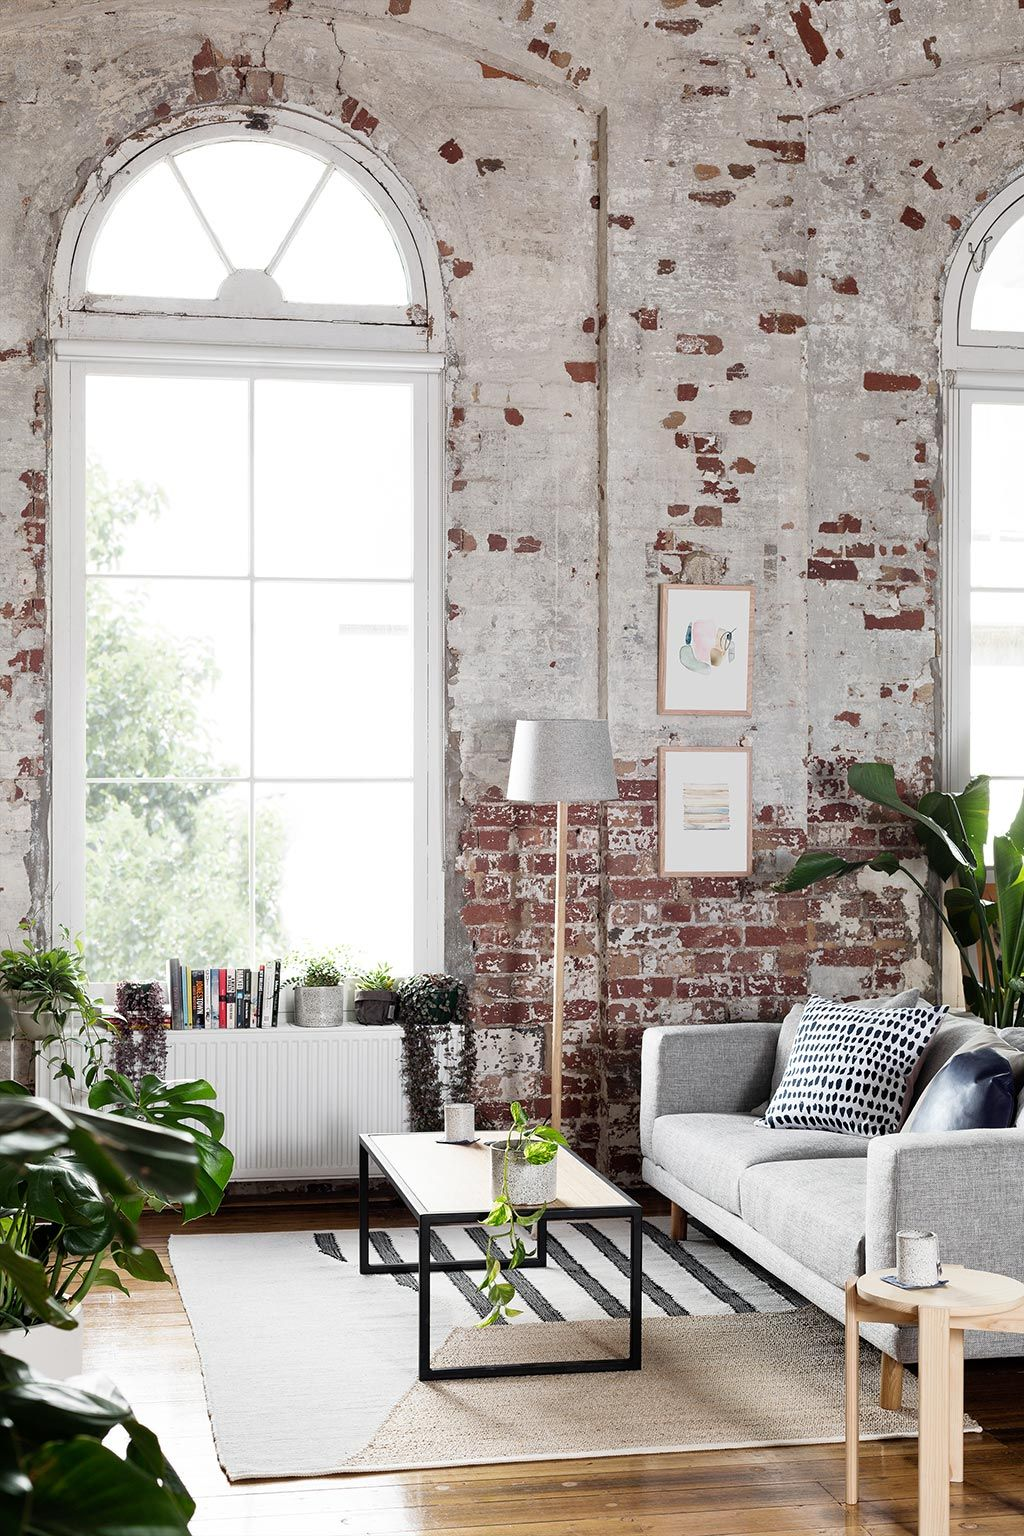 Loft interior mid century modern interior design boho style bricks interior houseplants